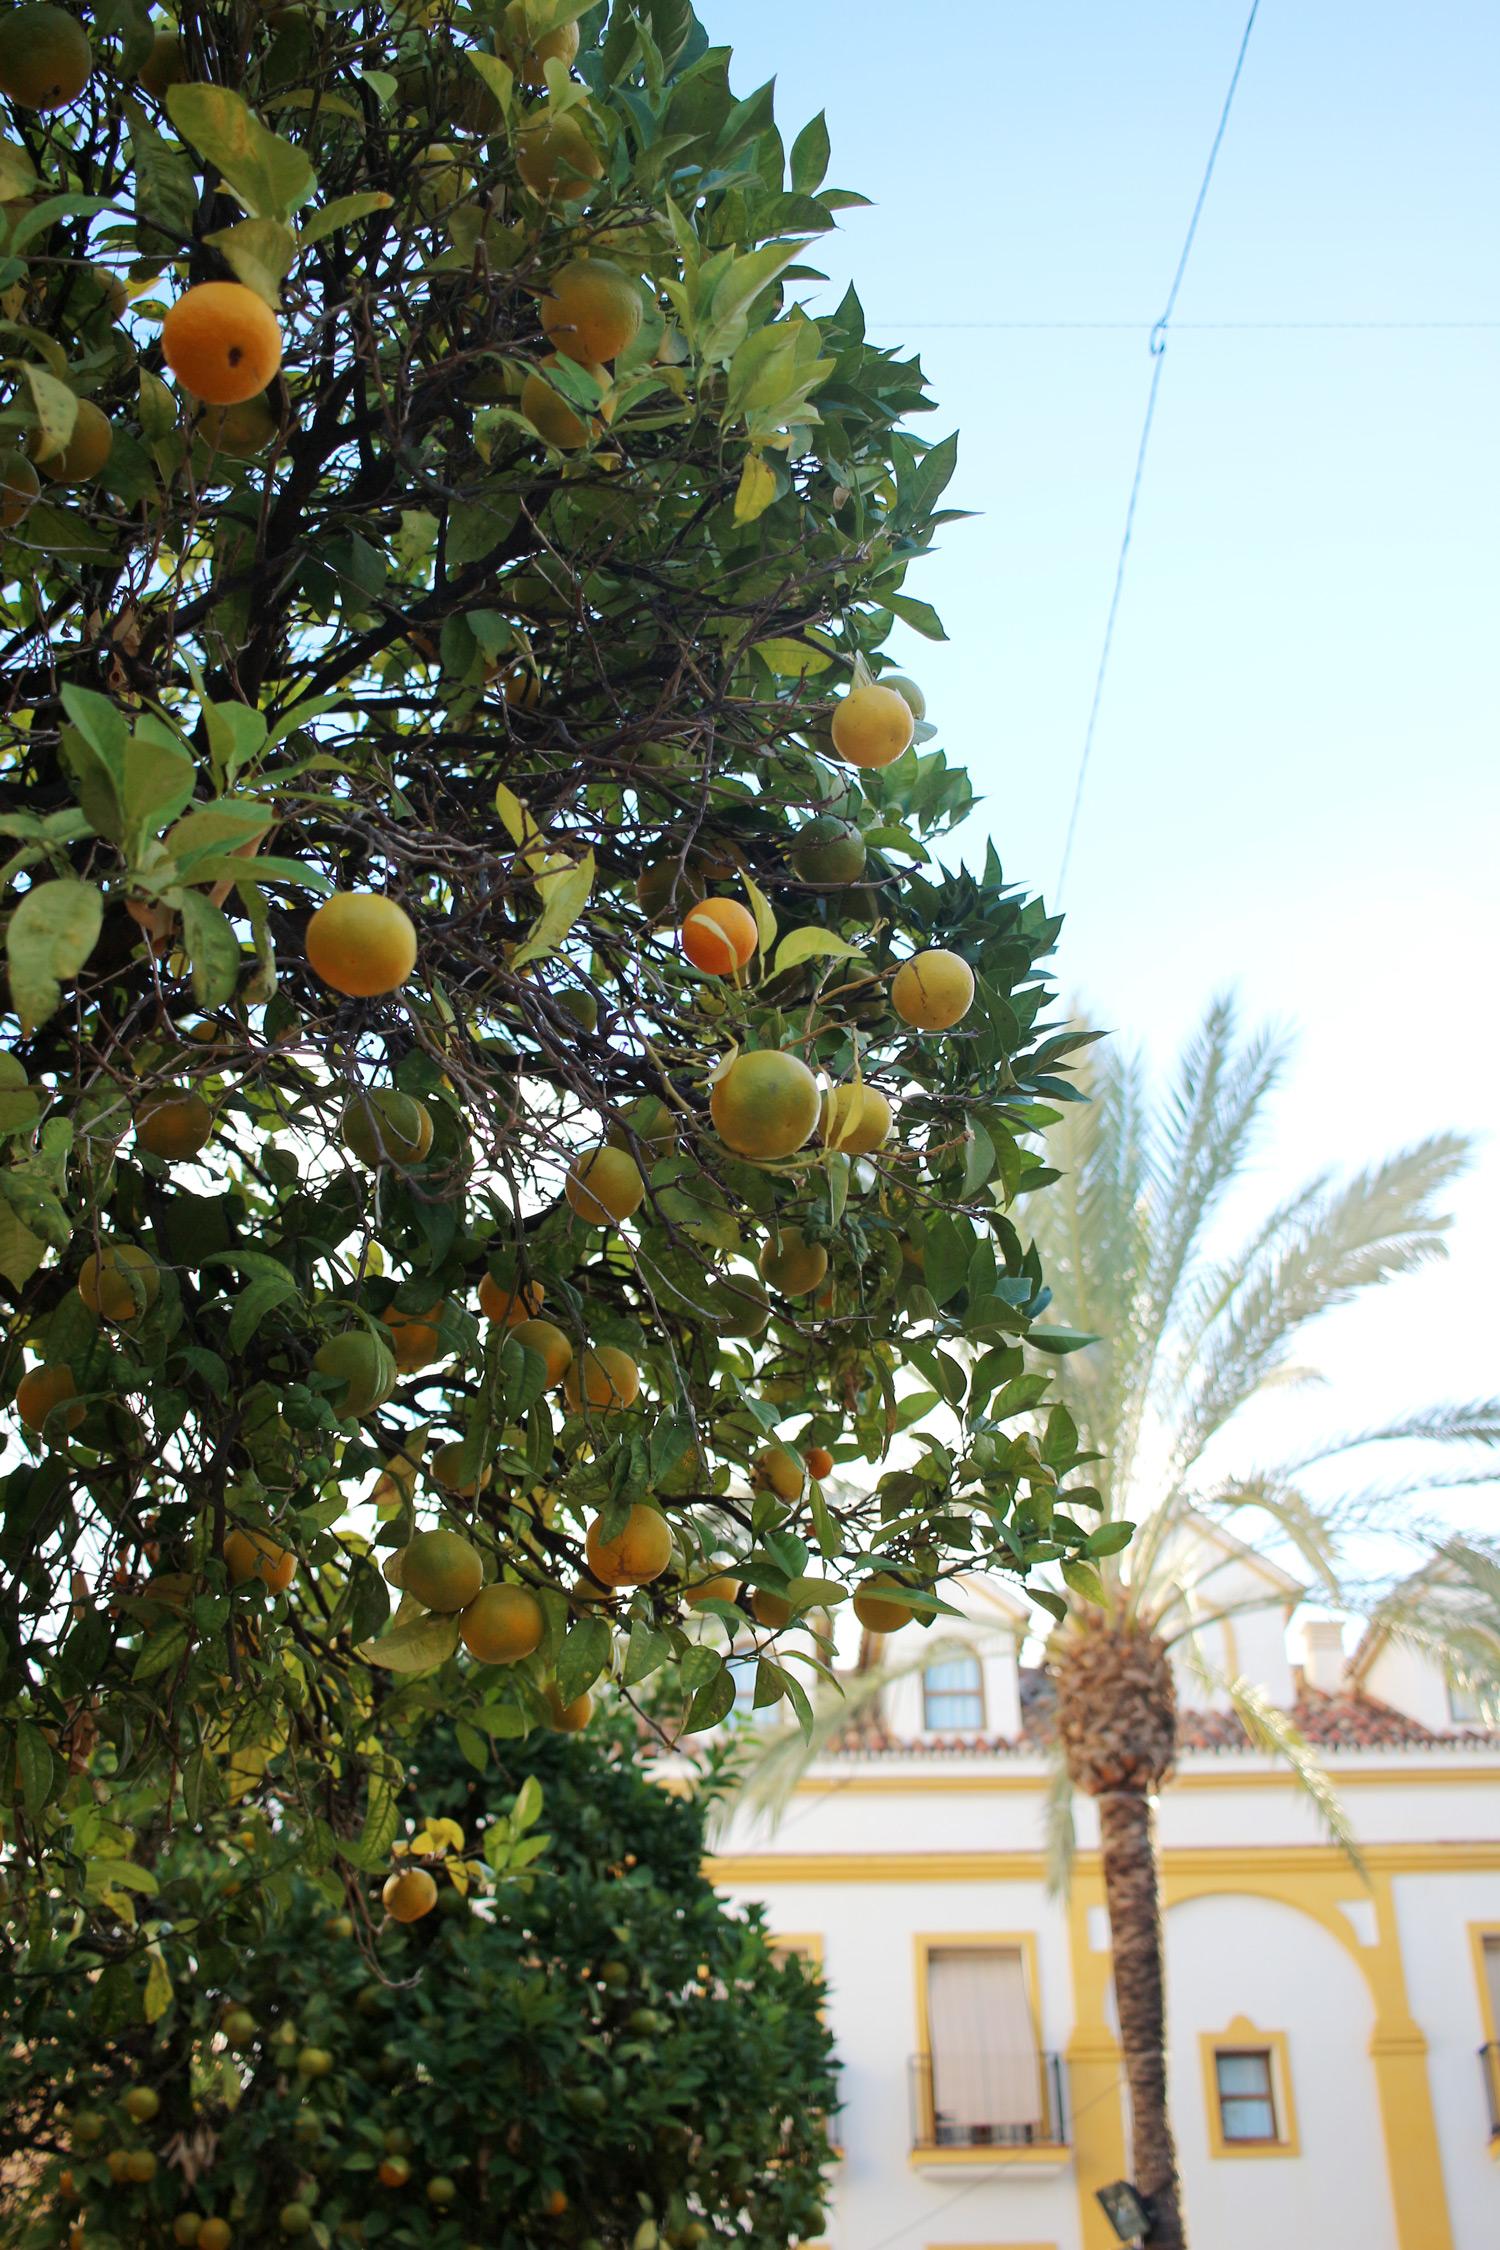 marbella-malaga-spain-travel-blogger-old-town-marbella-12